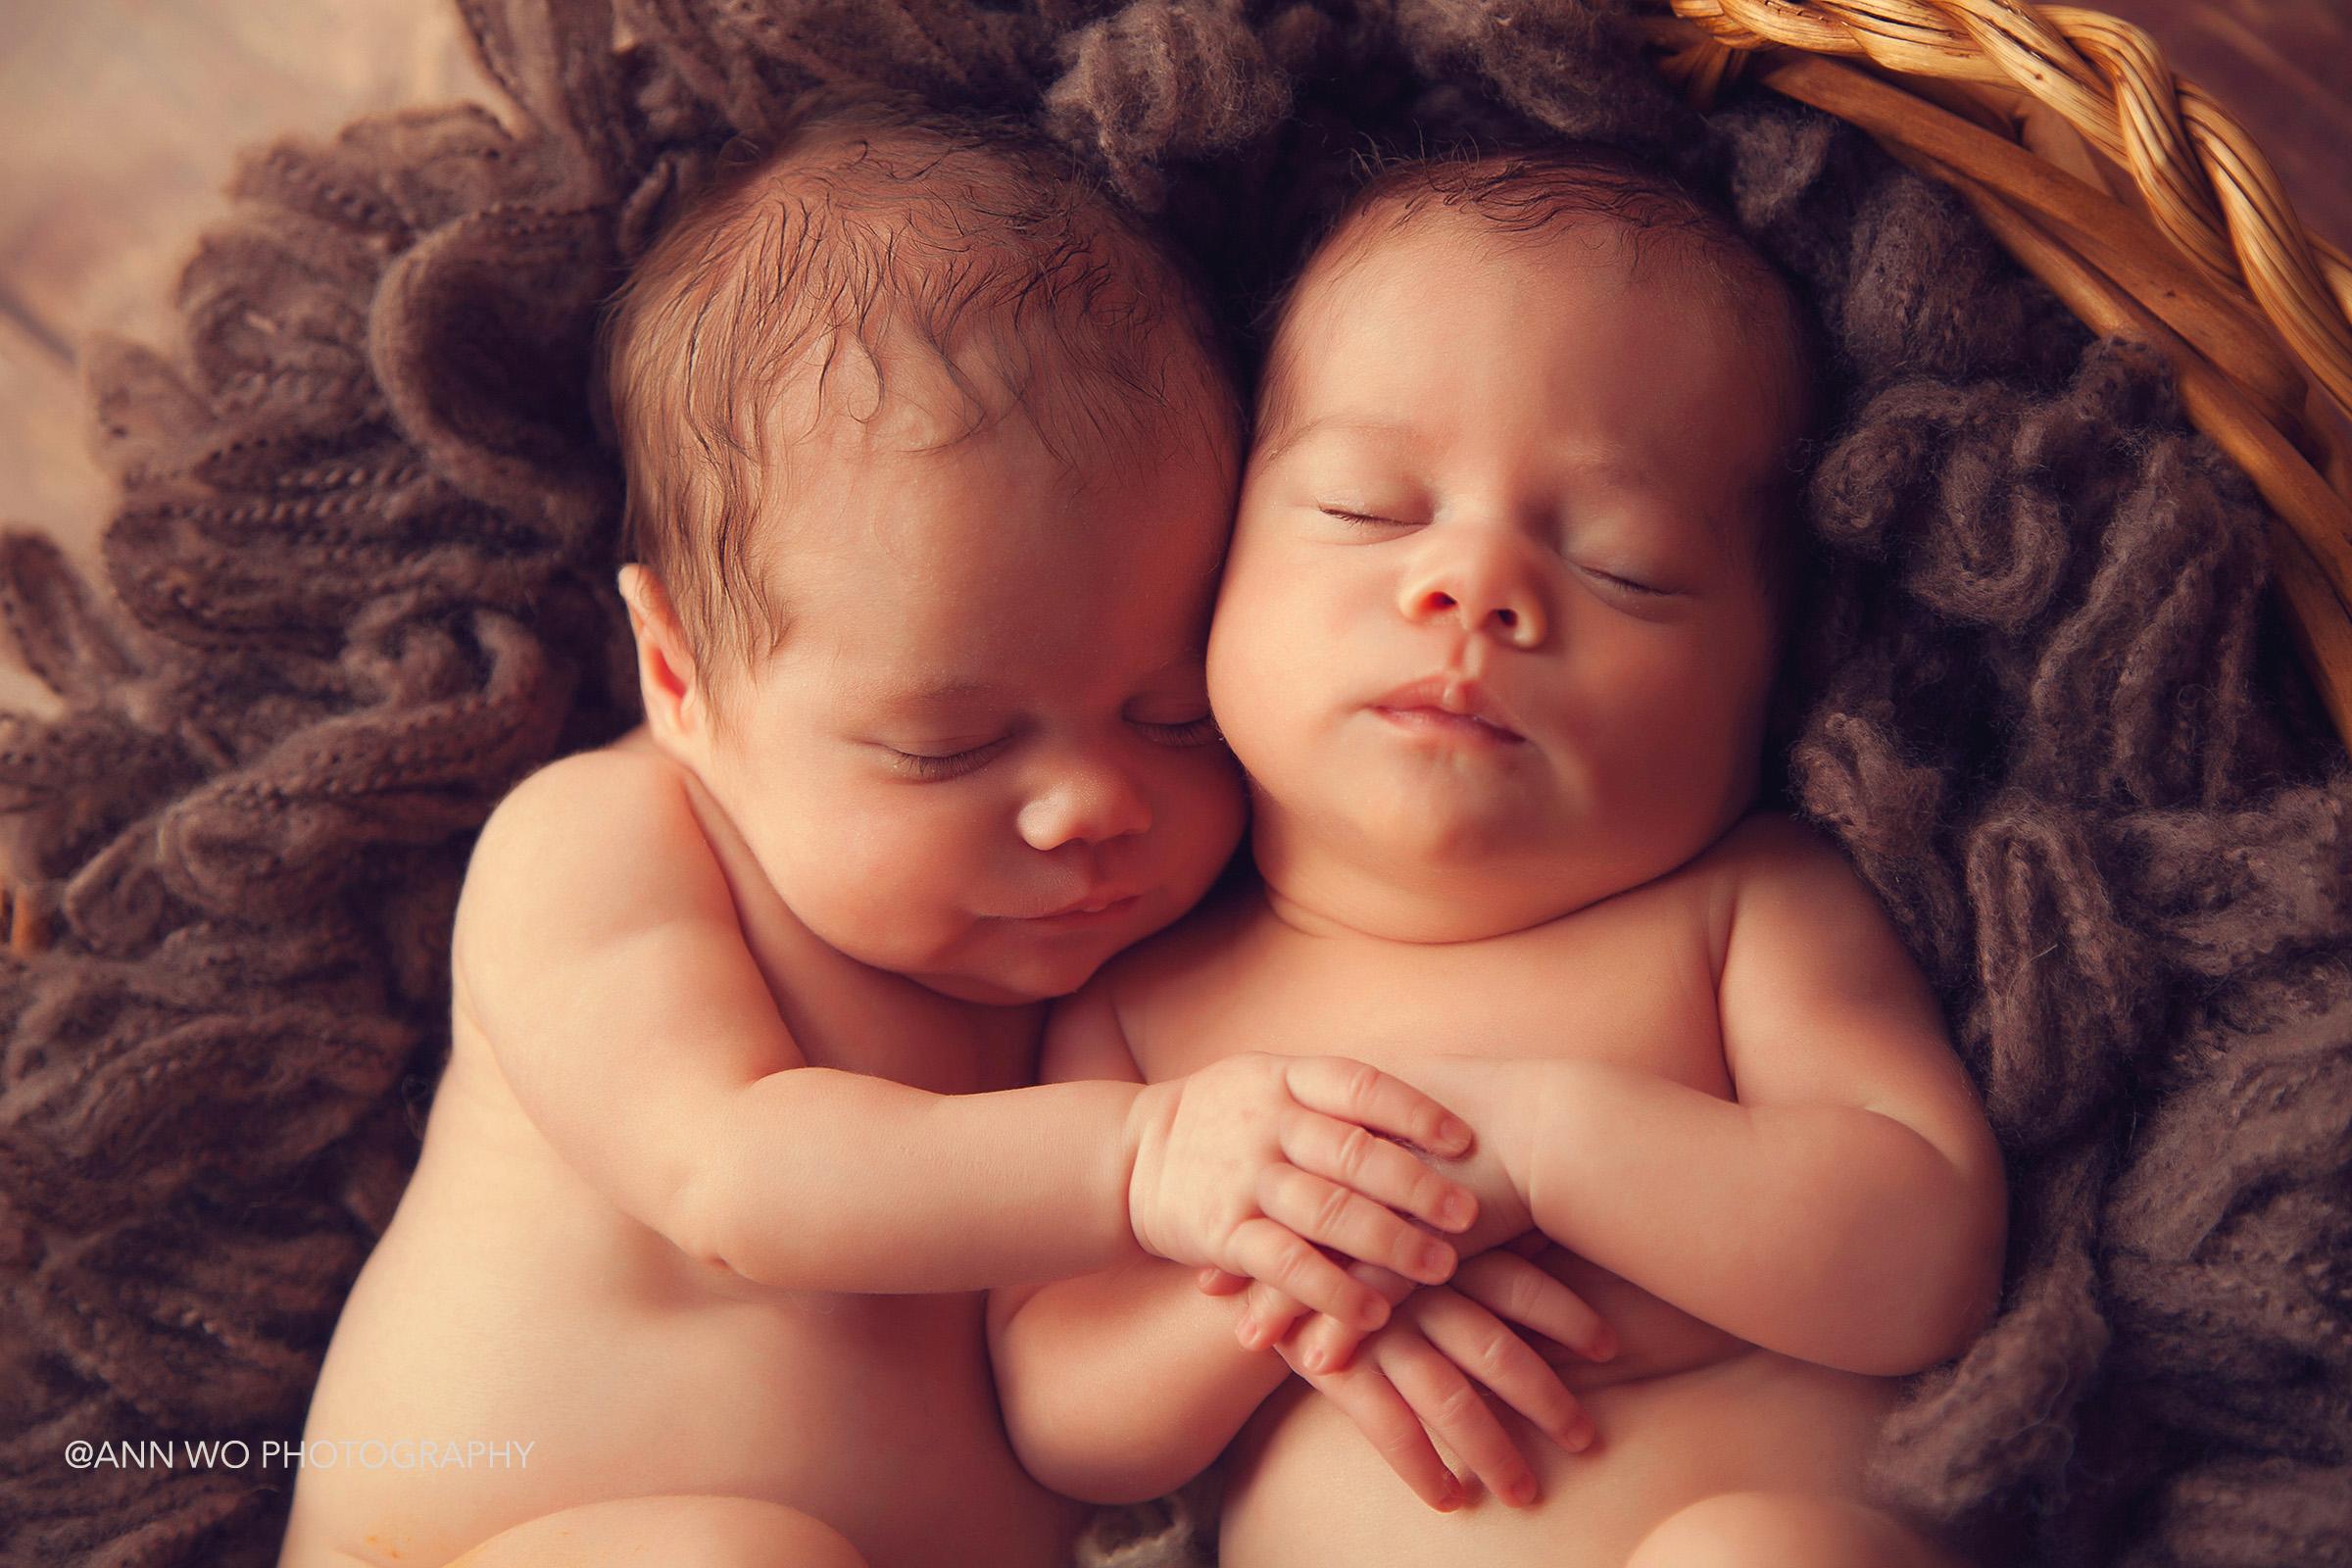 london-newborn-photography-with-twins08.jpg